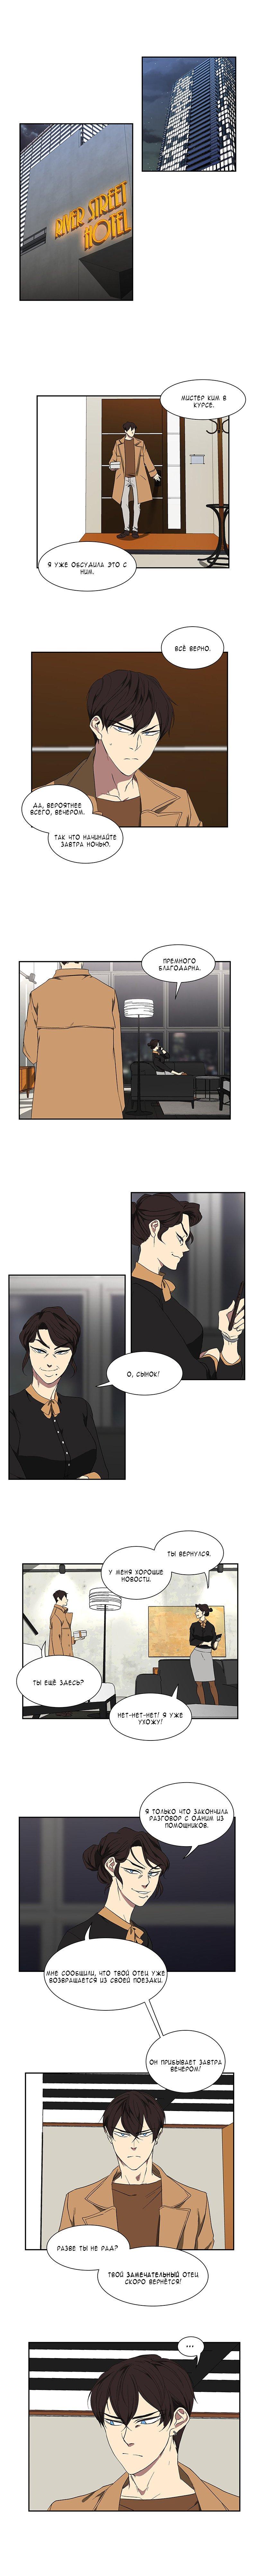 Манга Я люблю Ю / I love Yoo  - Том 1 Глава 42 Страница 4